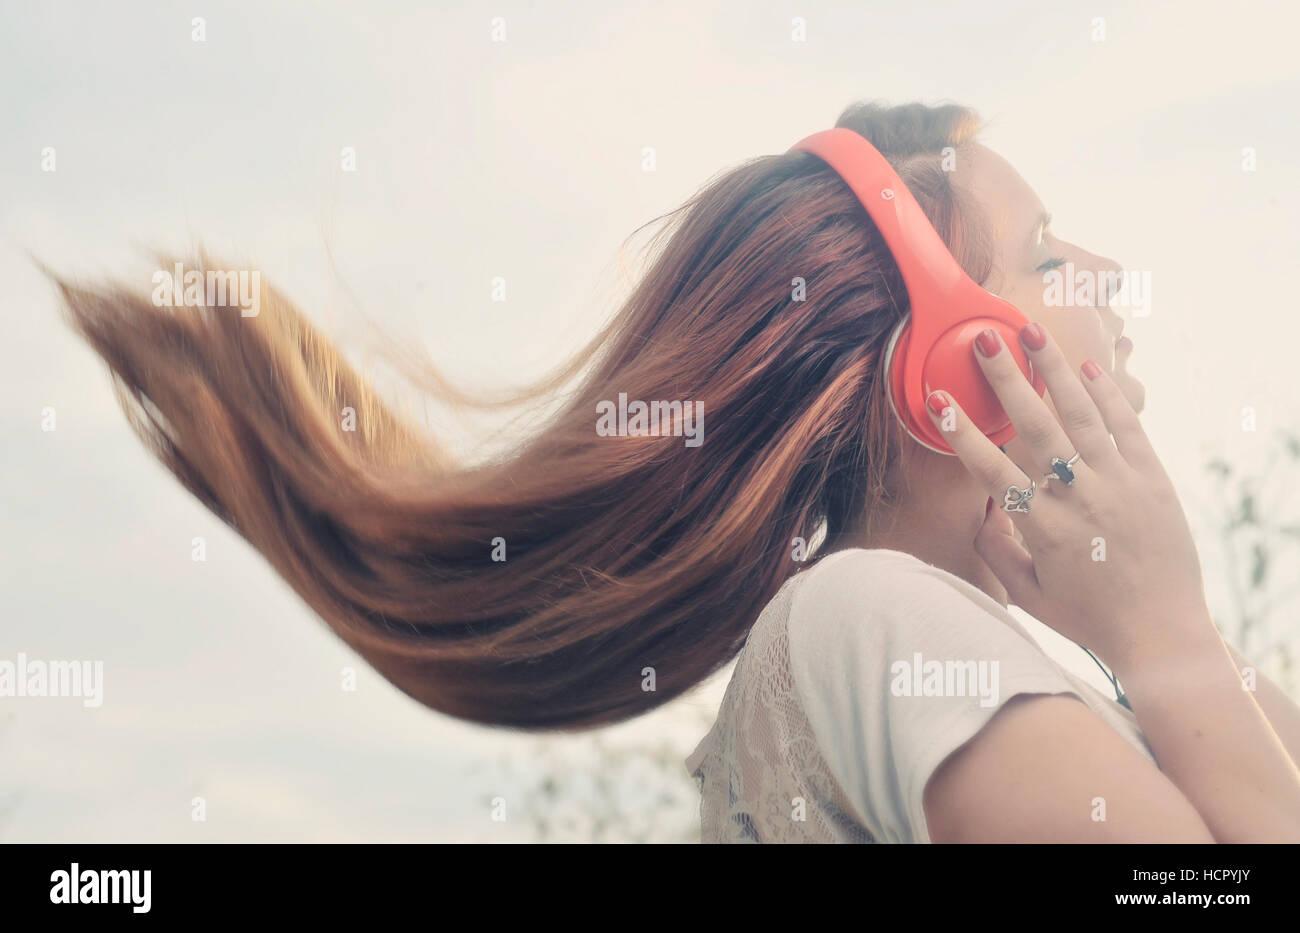 Mädchen ist die Musik über Kopfhörer hören Stockbild